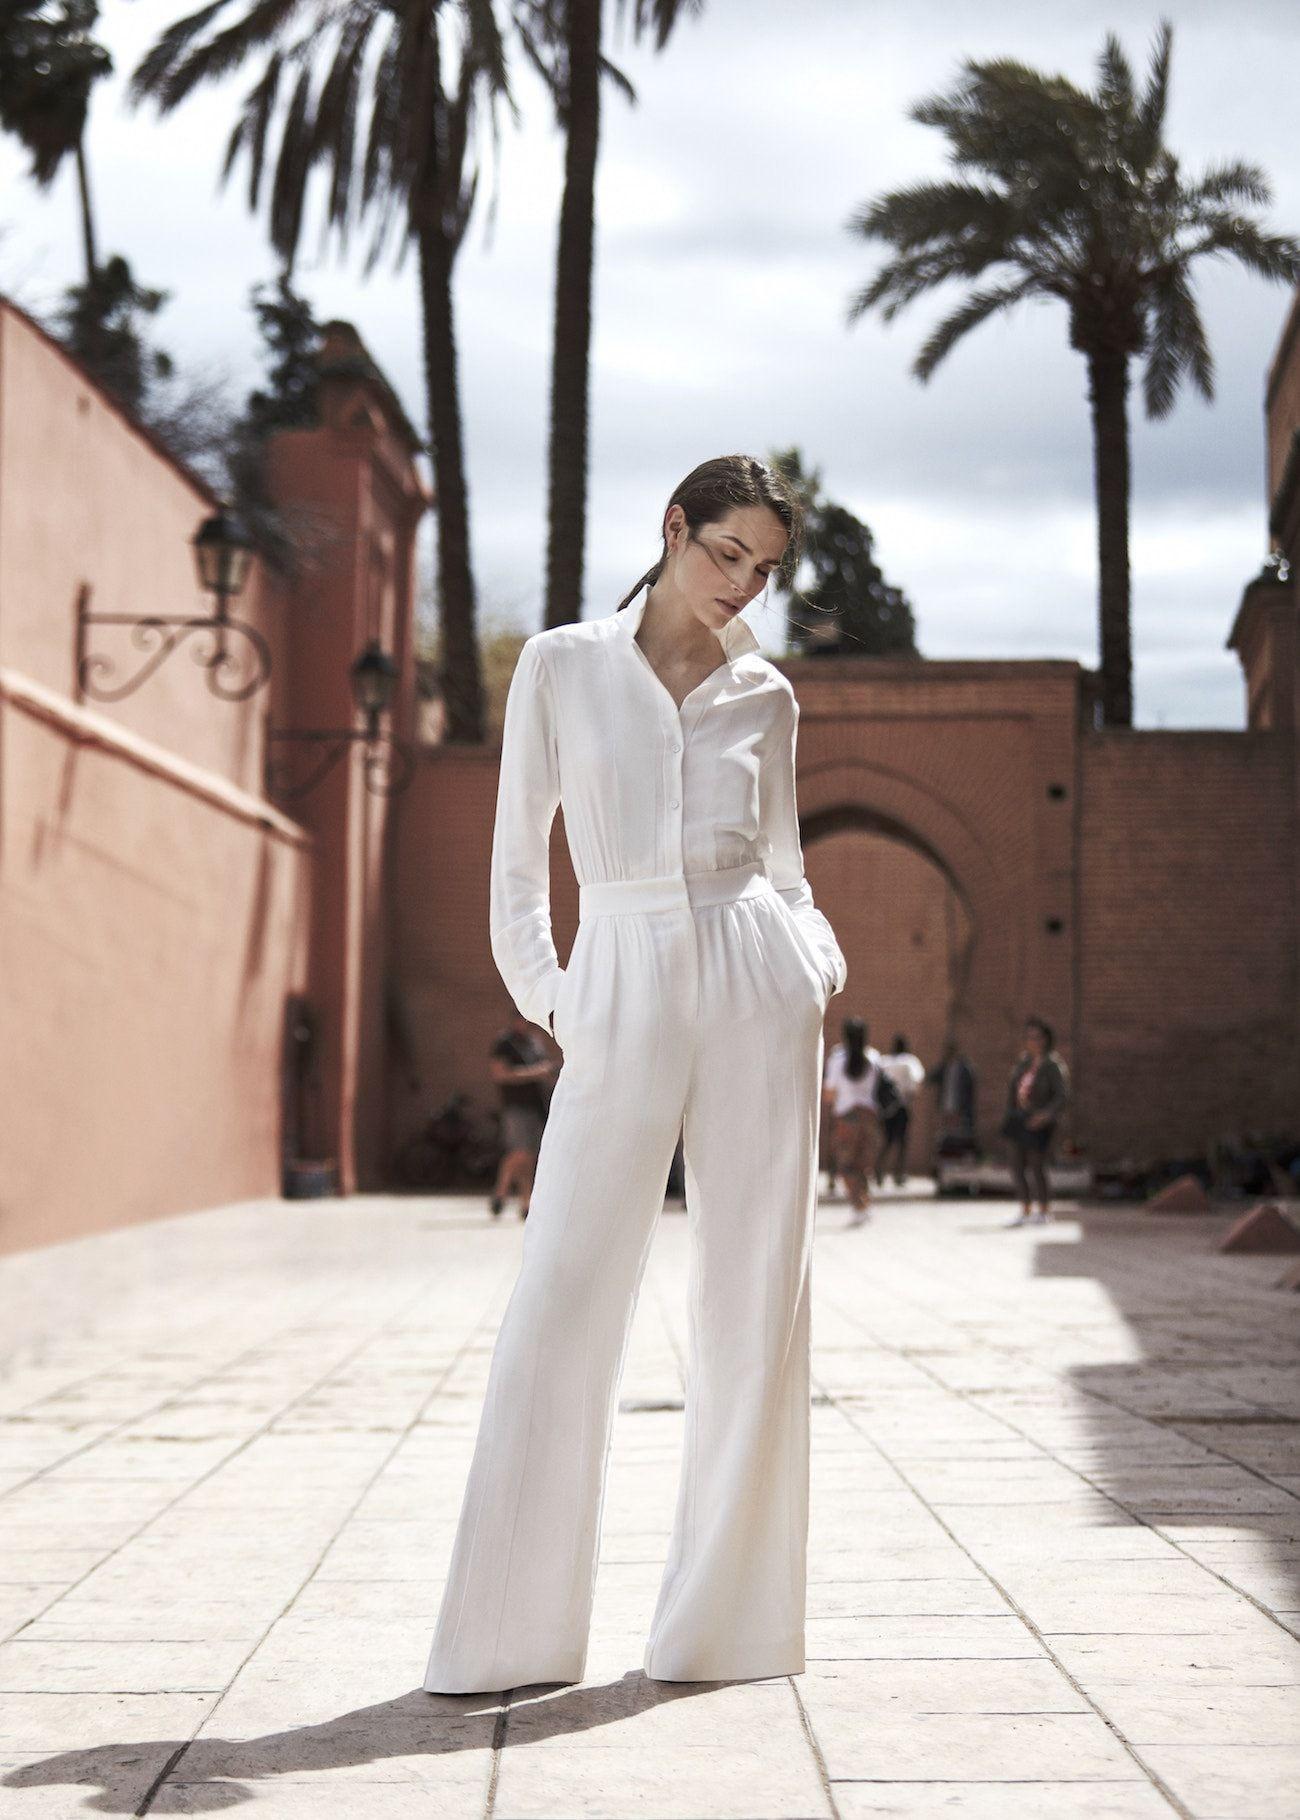 b5e9bb401d5 Reiss Juno Wide-leg Jumpsuit Wedding Guest Outfit